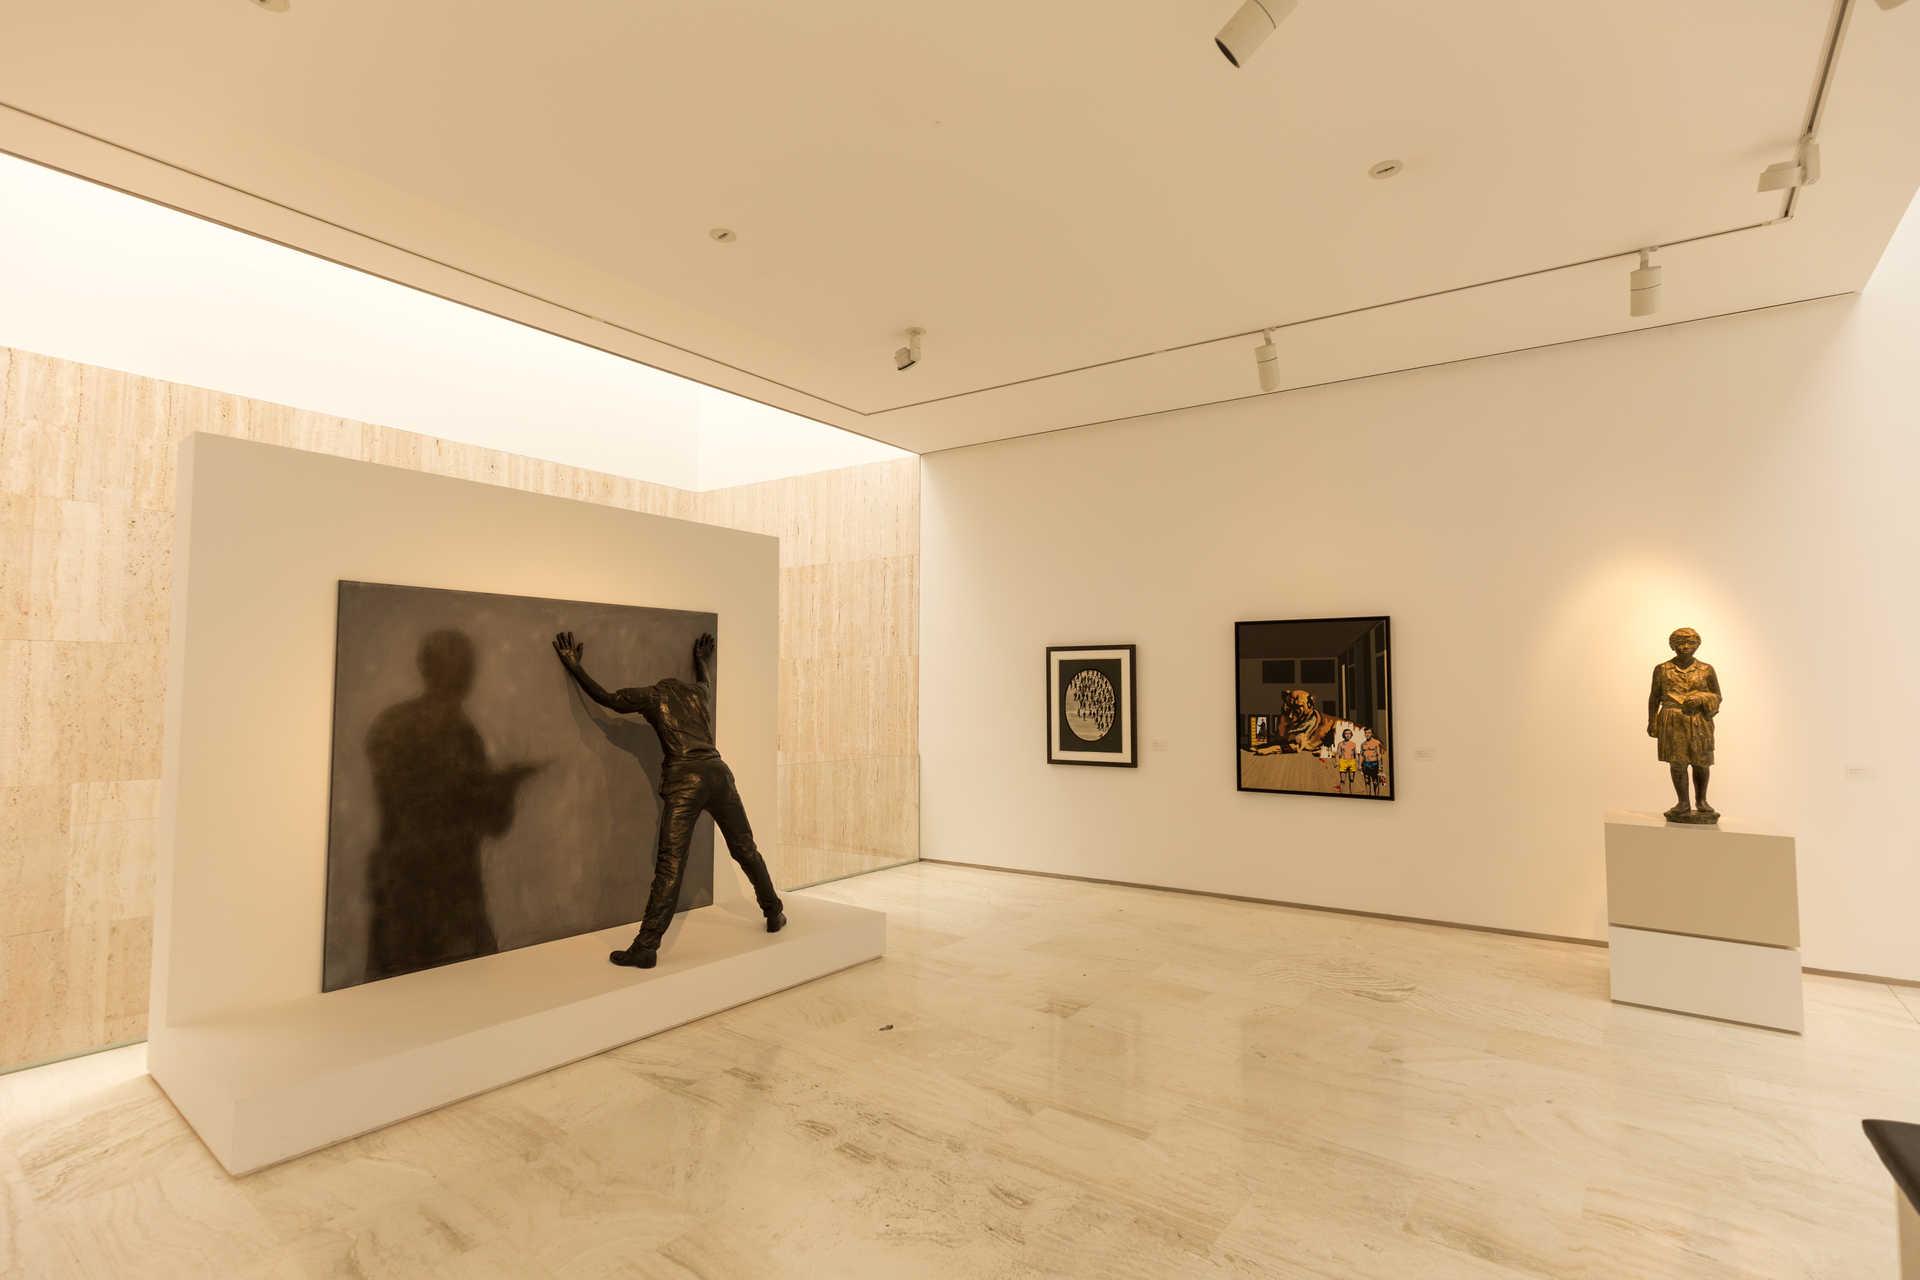 MUSEUM OF CONTEMPORANY ART OF ALICANTE